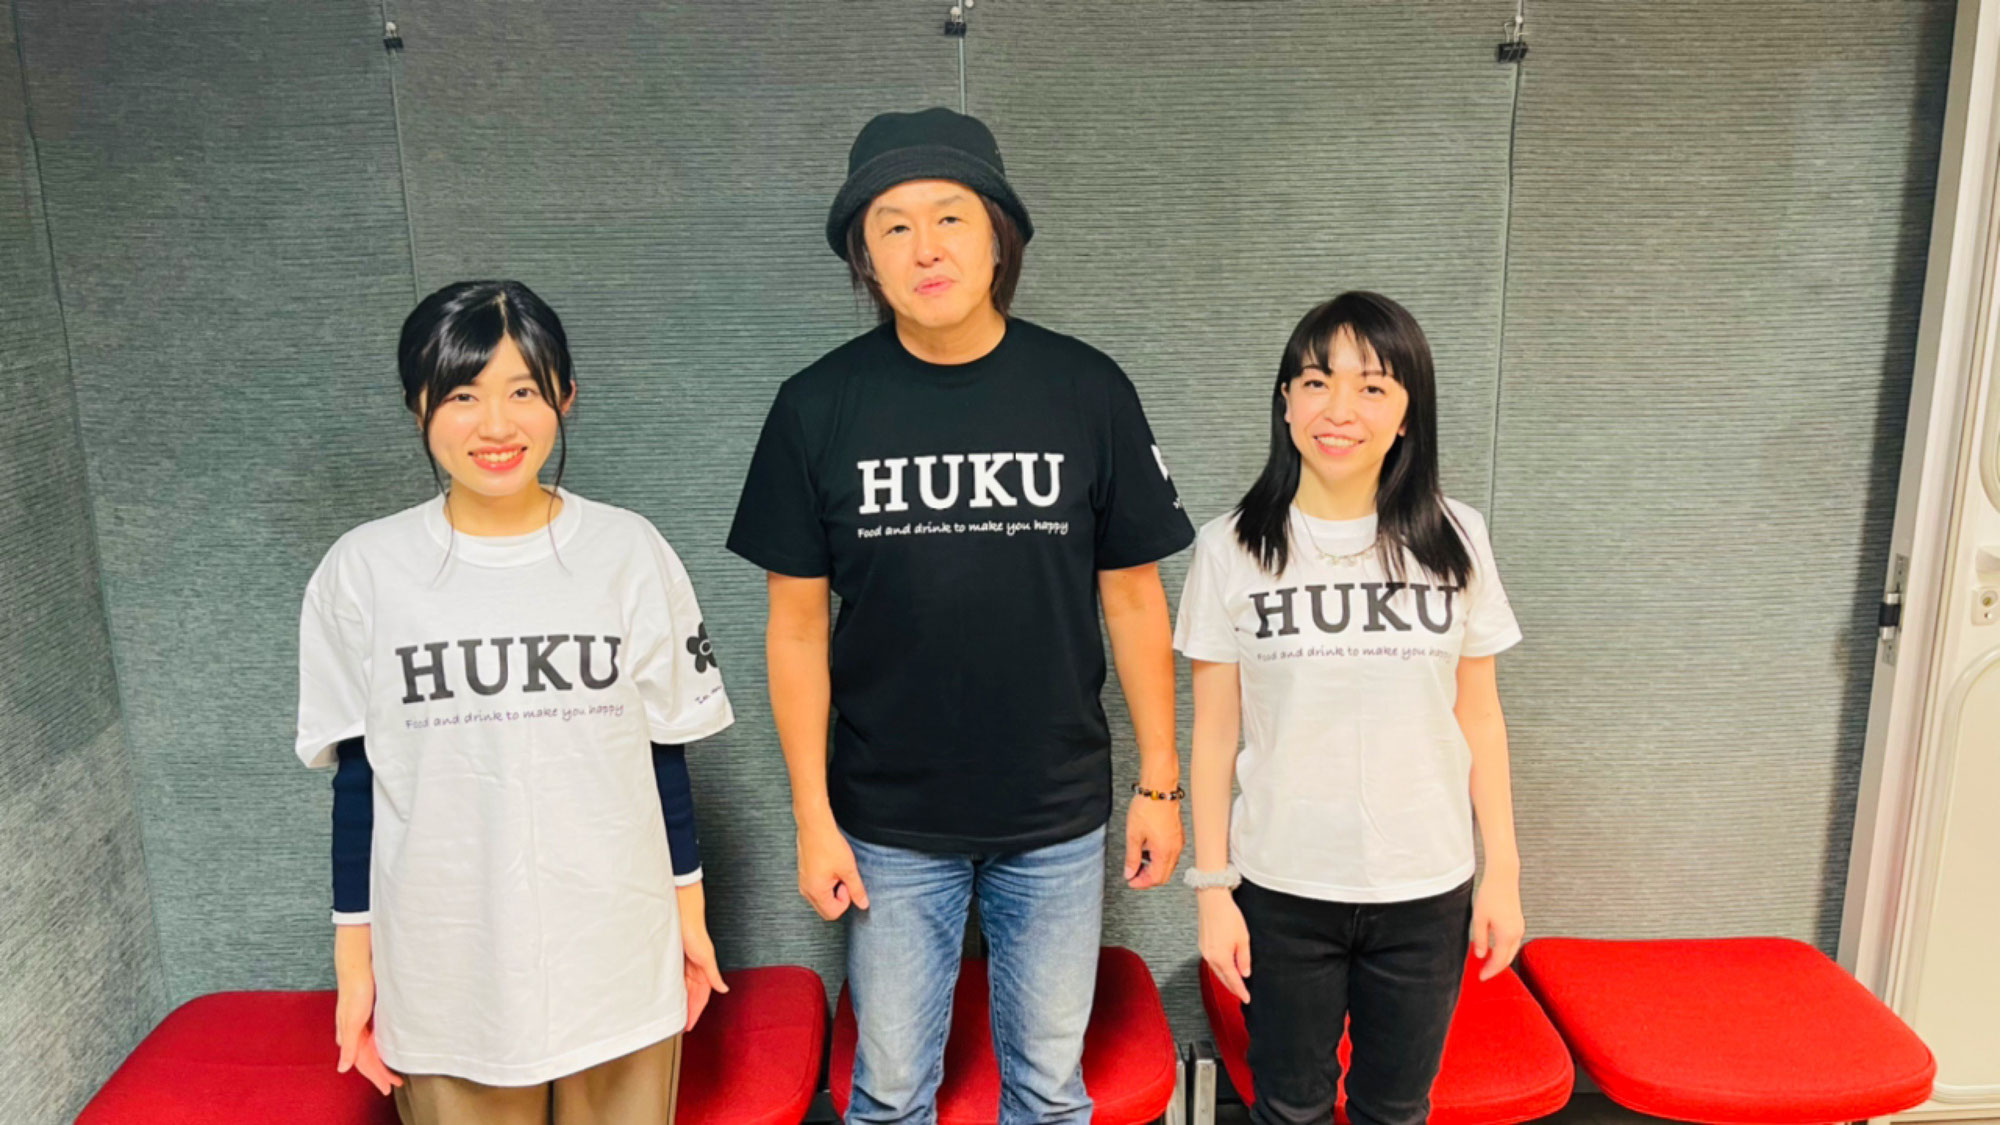 In my STUDIO×Momo's Izakaya福 Tシャツ